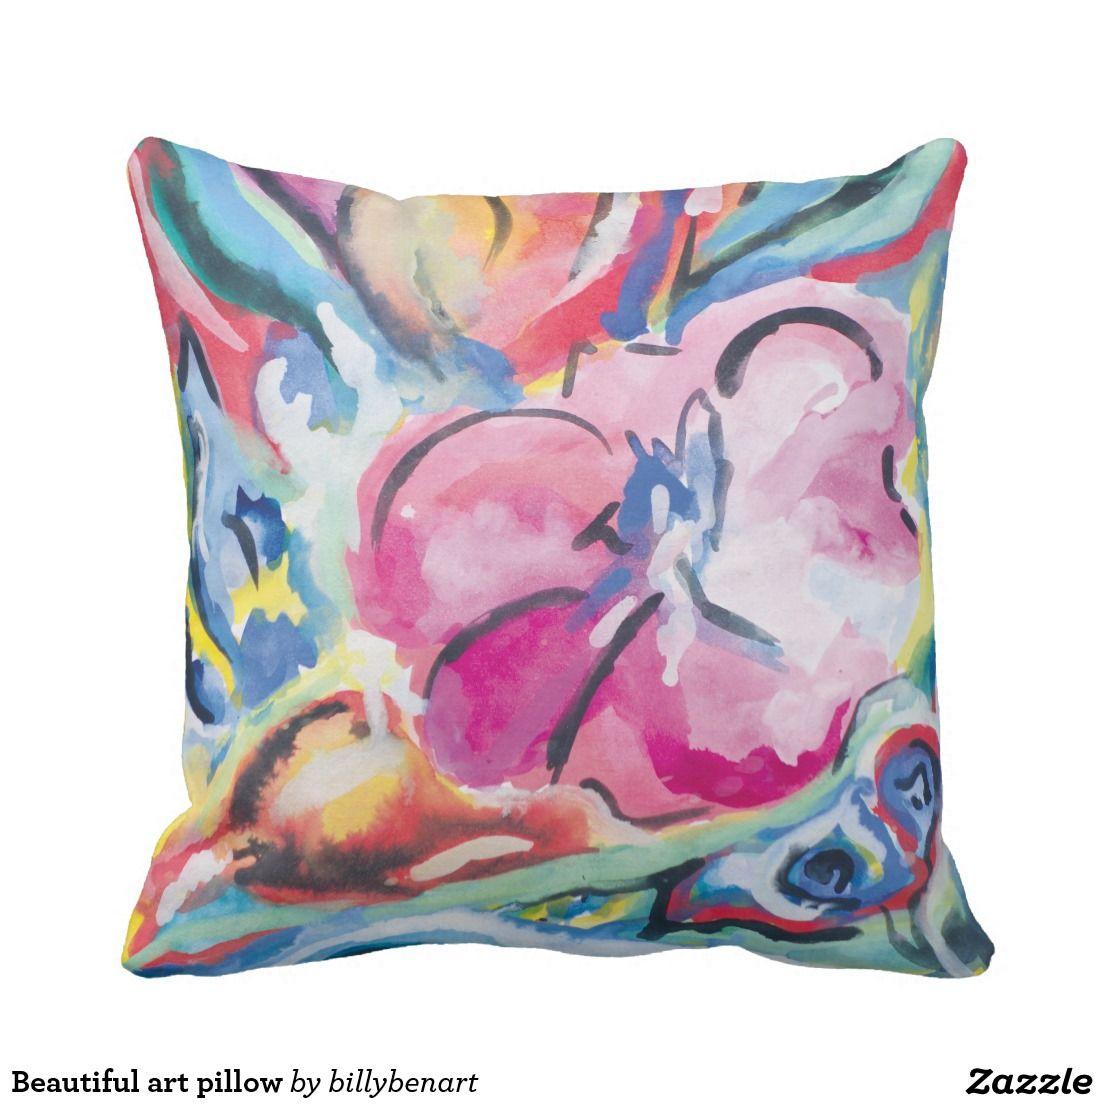 Beautiful art pillow pillows